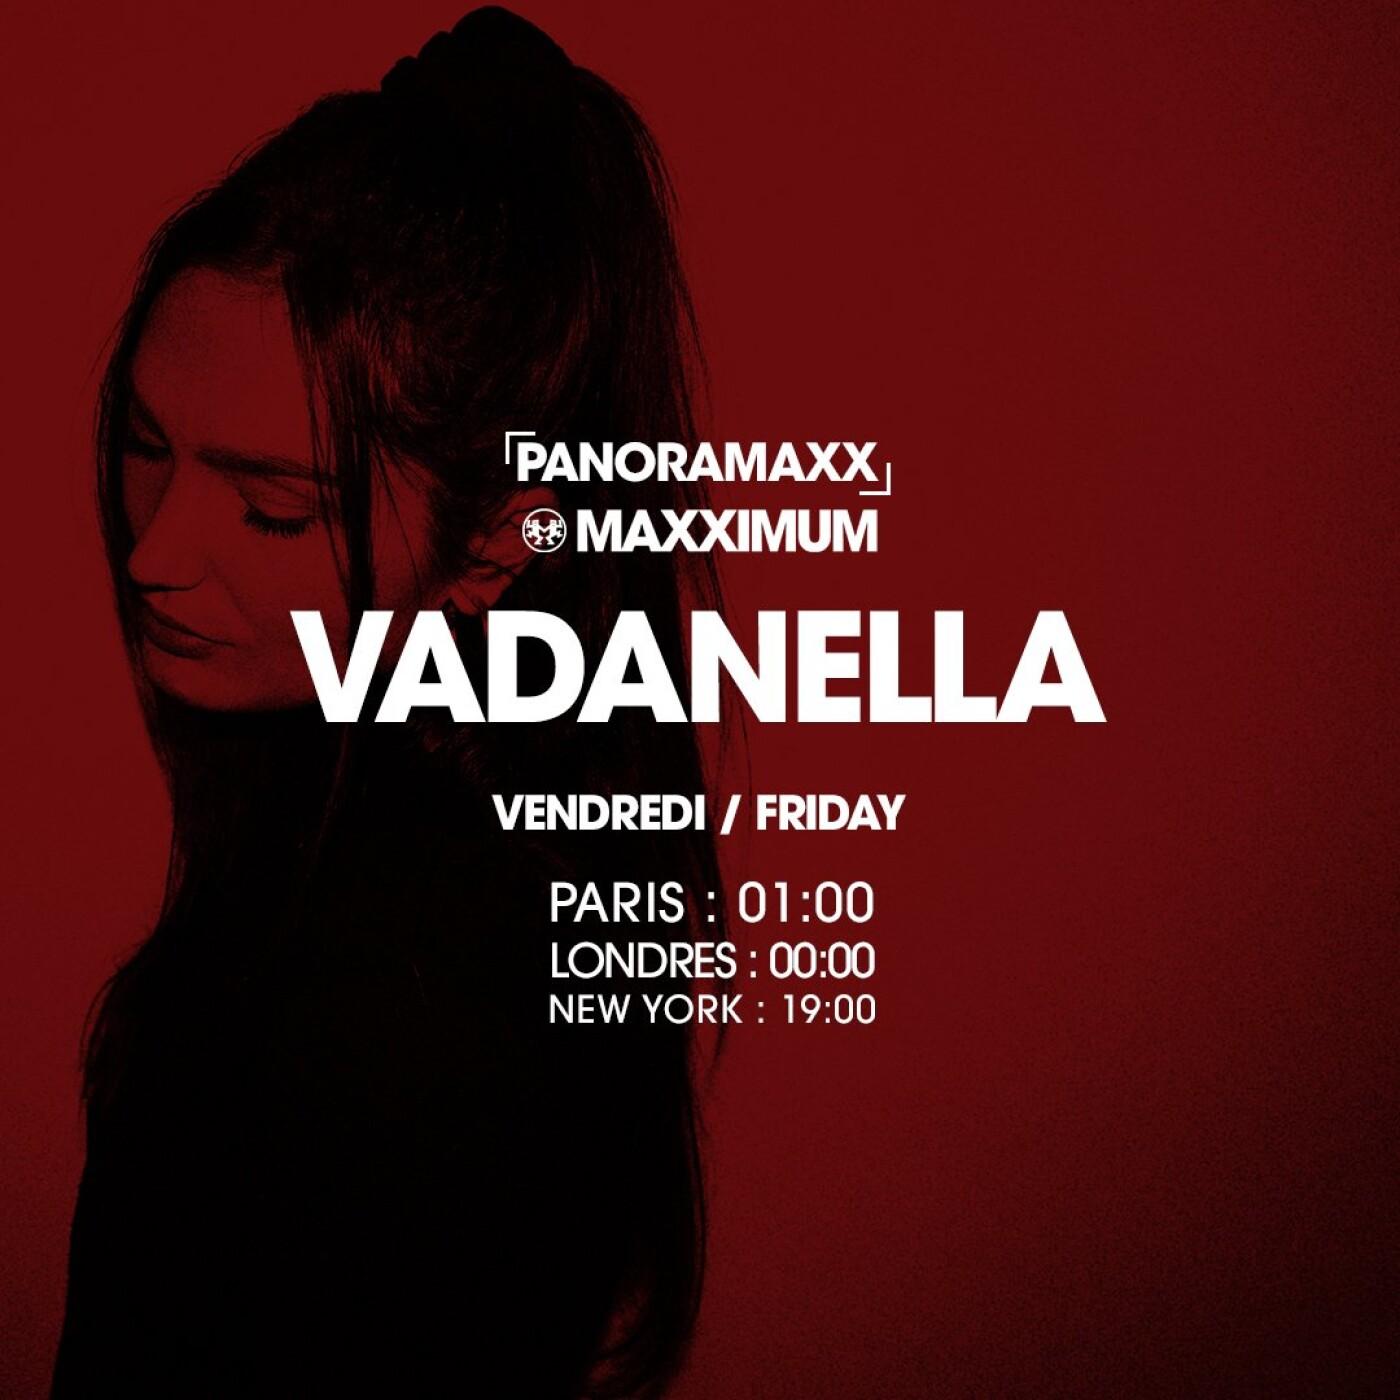 PANORAMAXX : VADANELLA